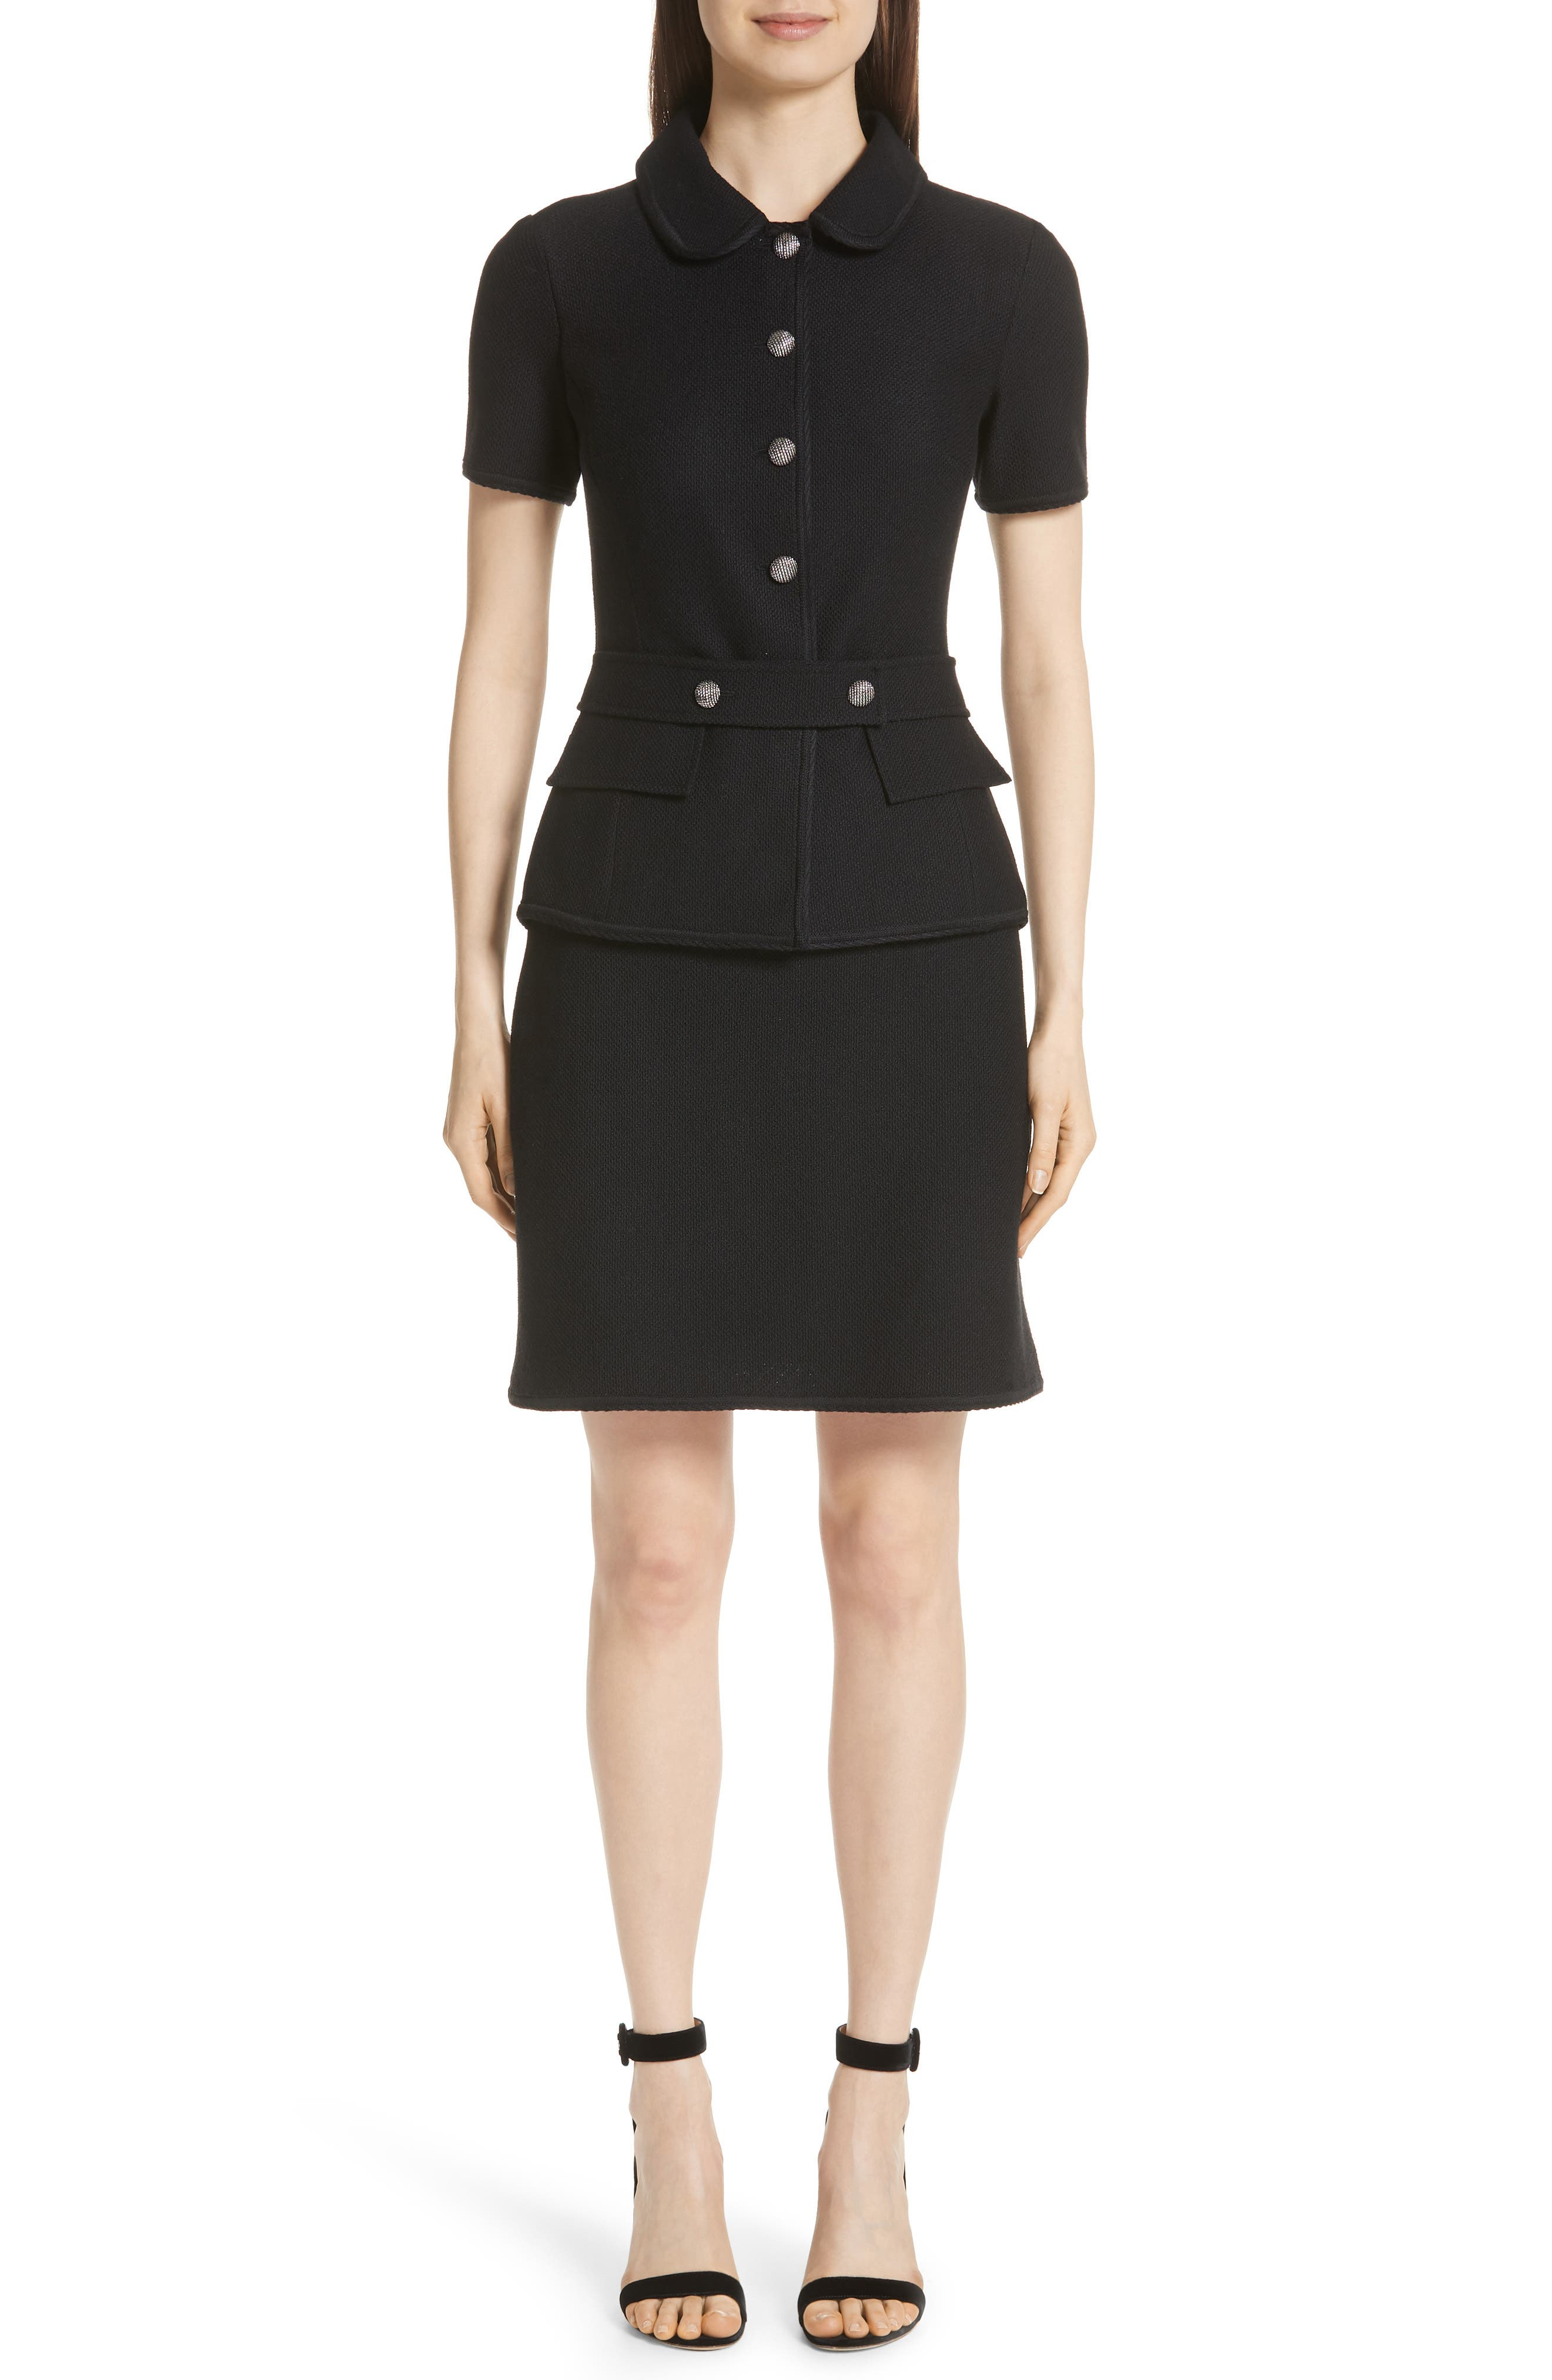 St. John Collection Gail Knit Dress, Black